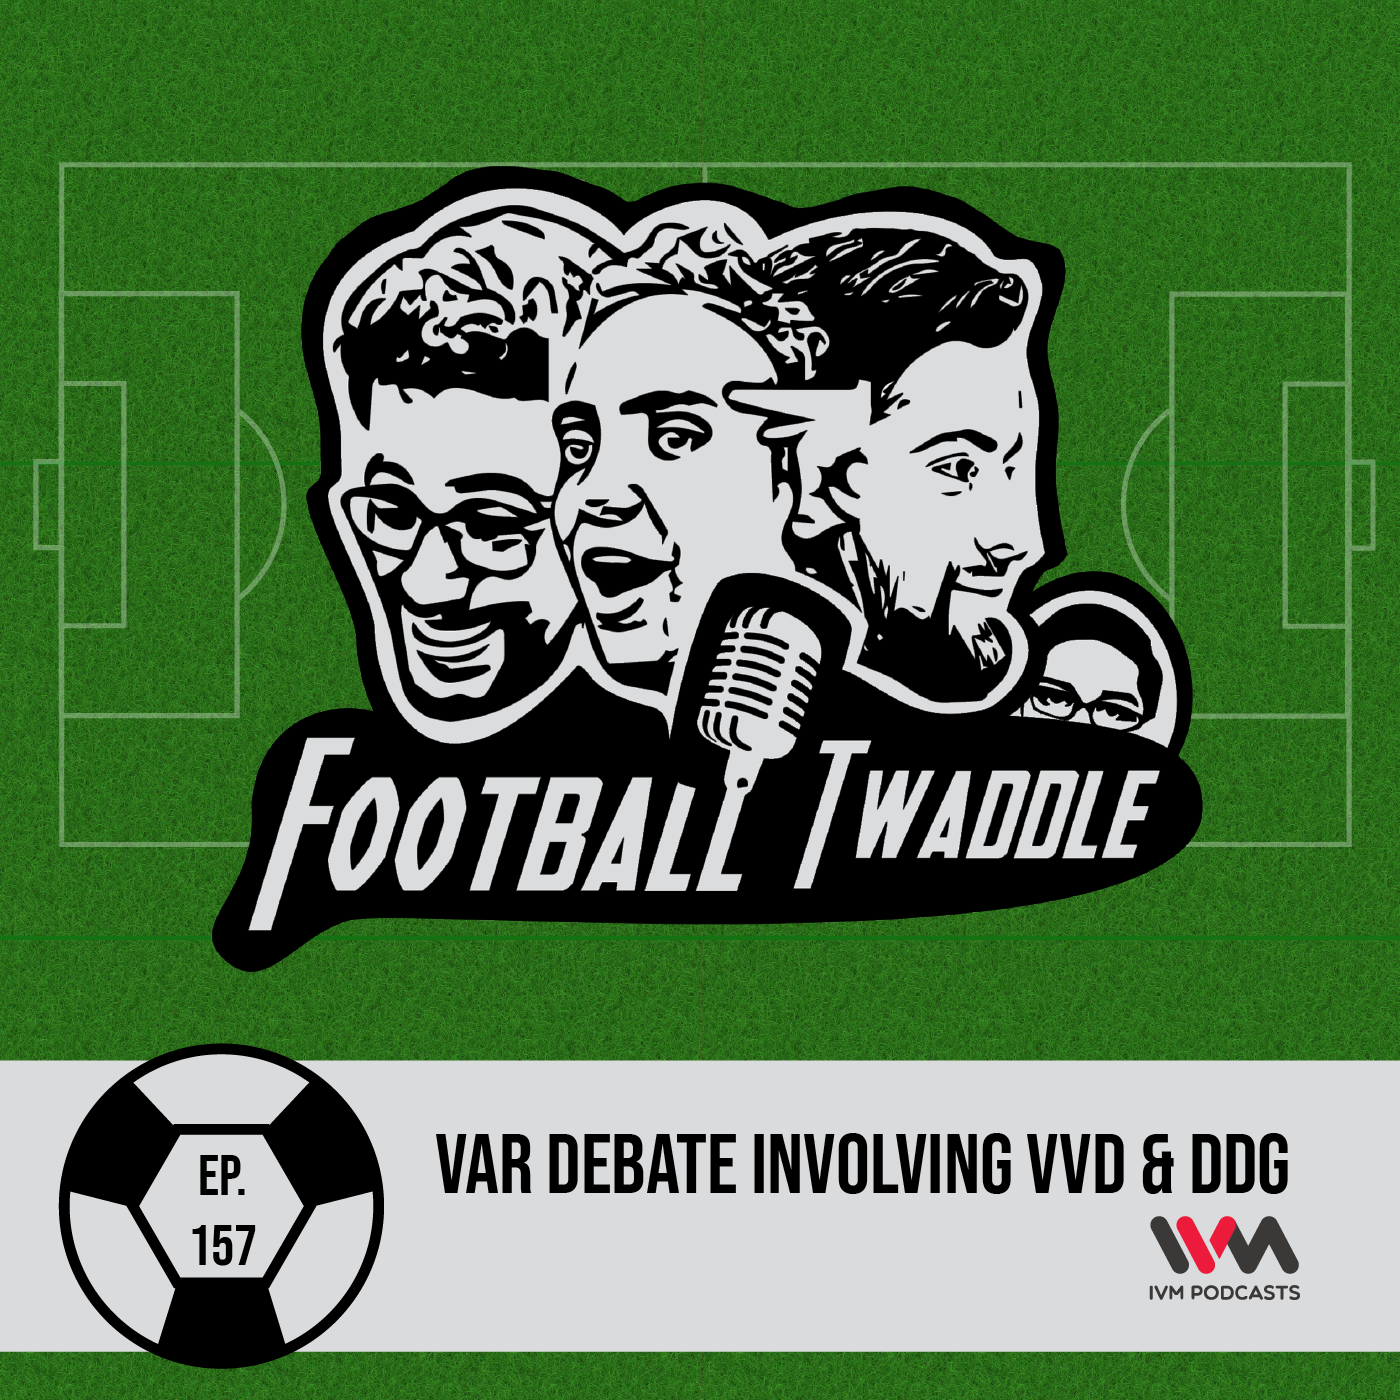 VAR debate involving VVD & DDG